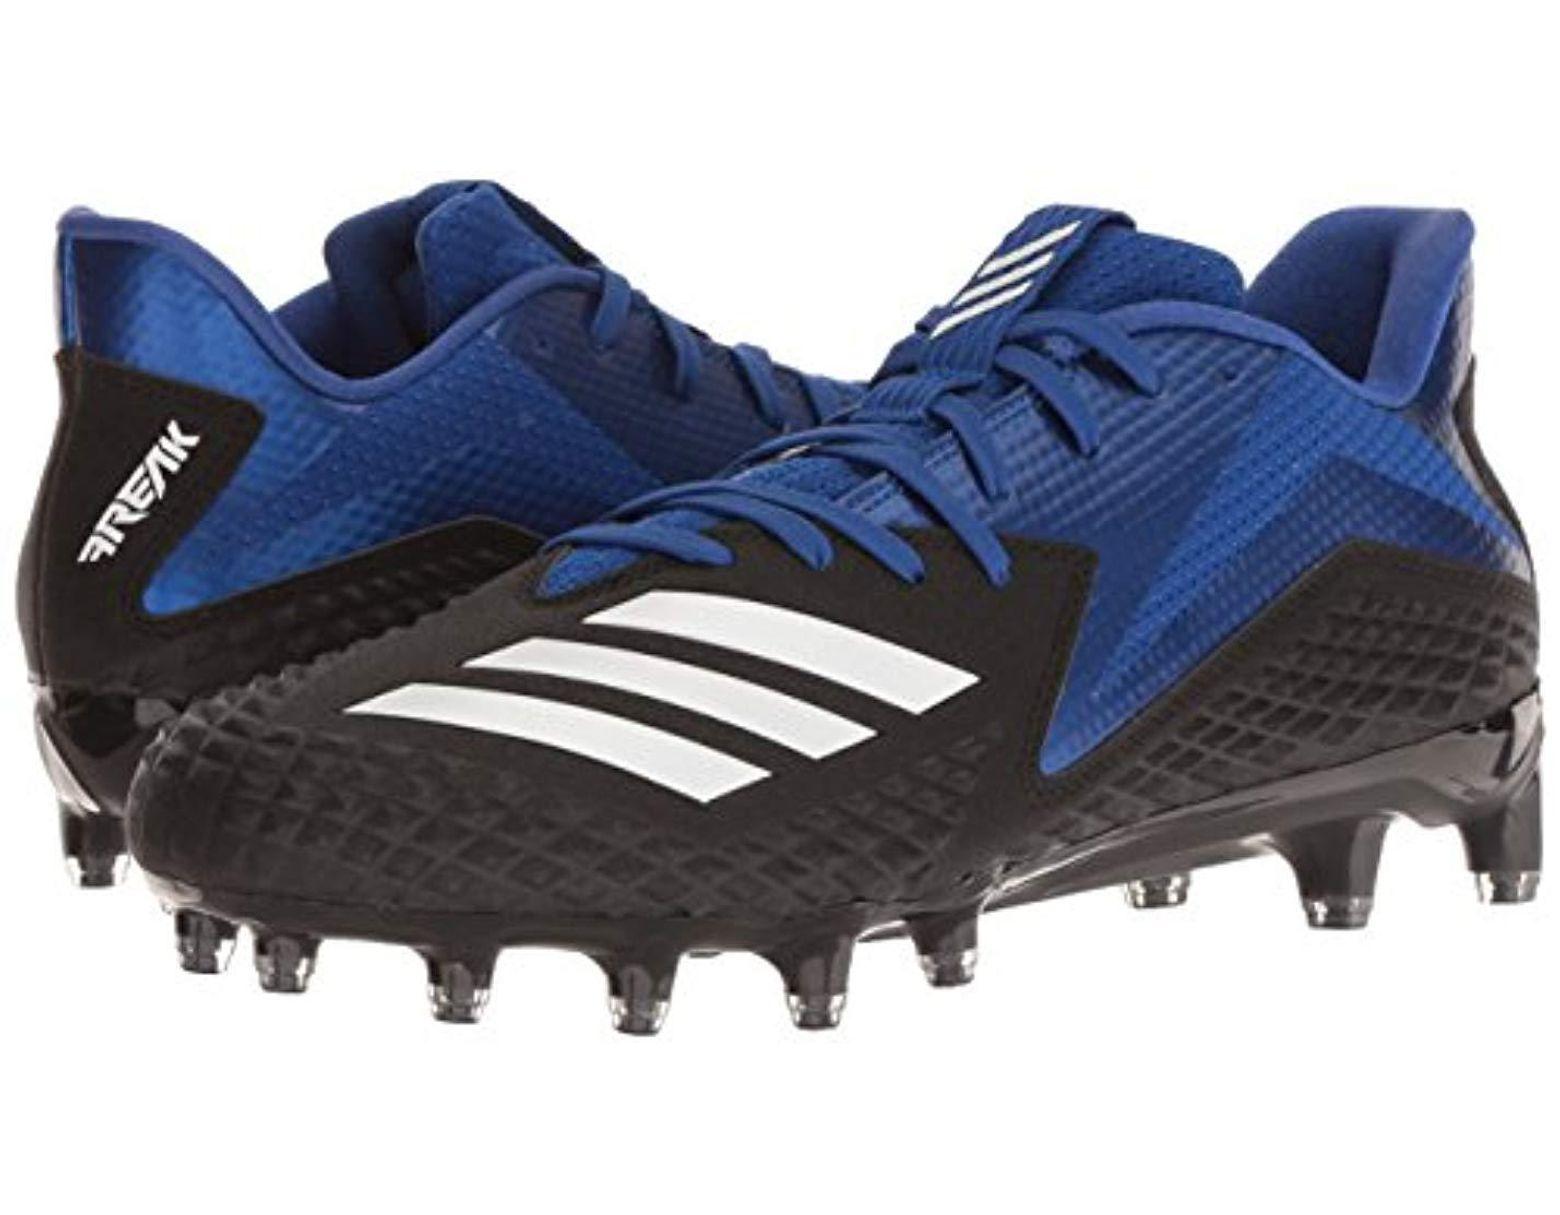 2c39314cfe5bd Men's Black Freak X Carbon Mid Football Shoe